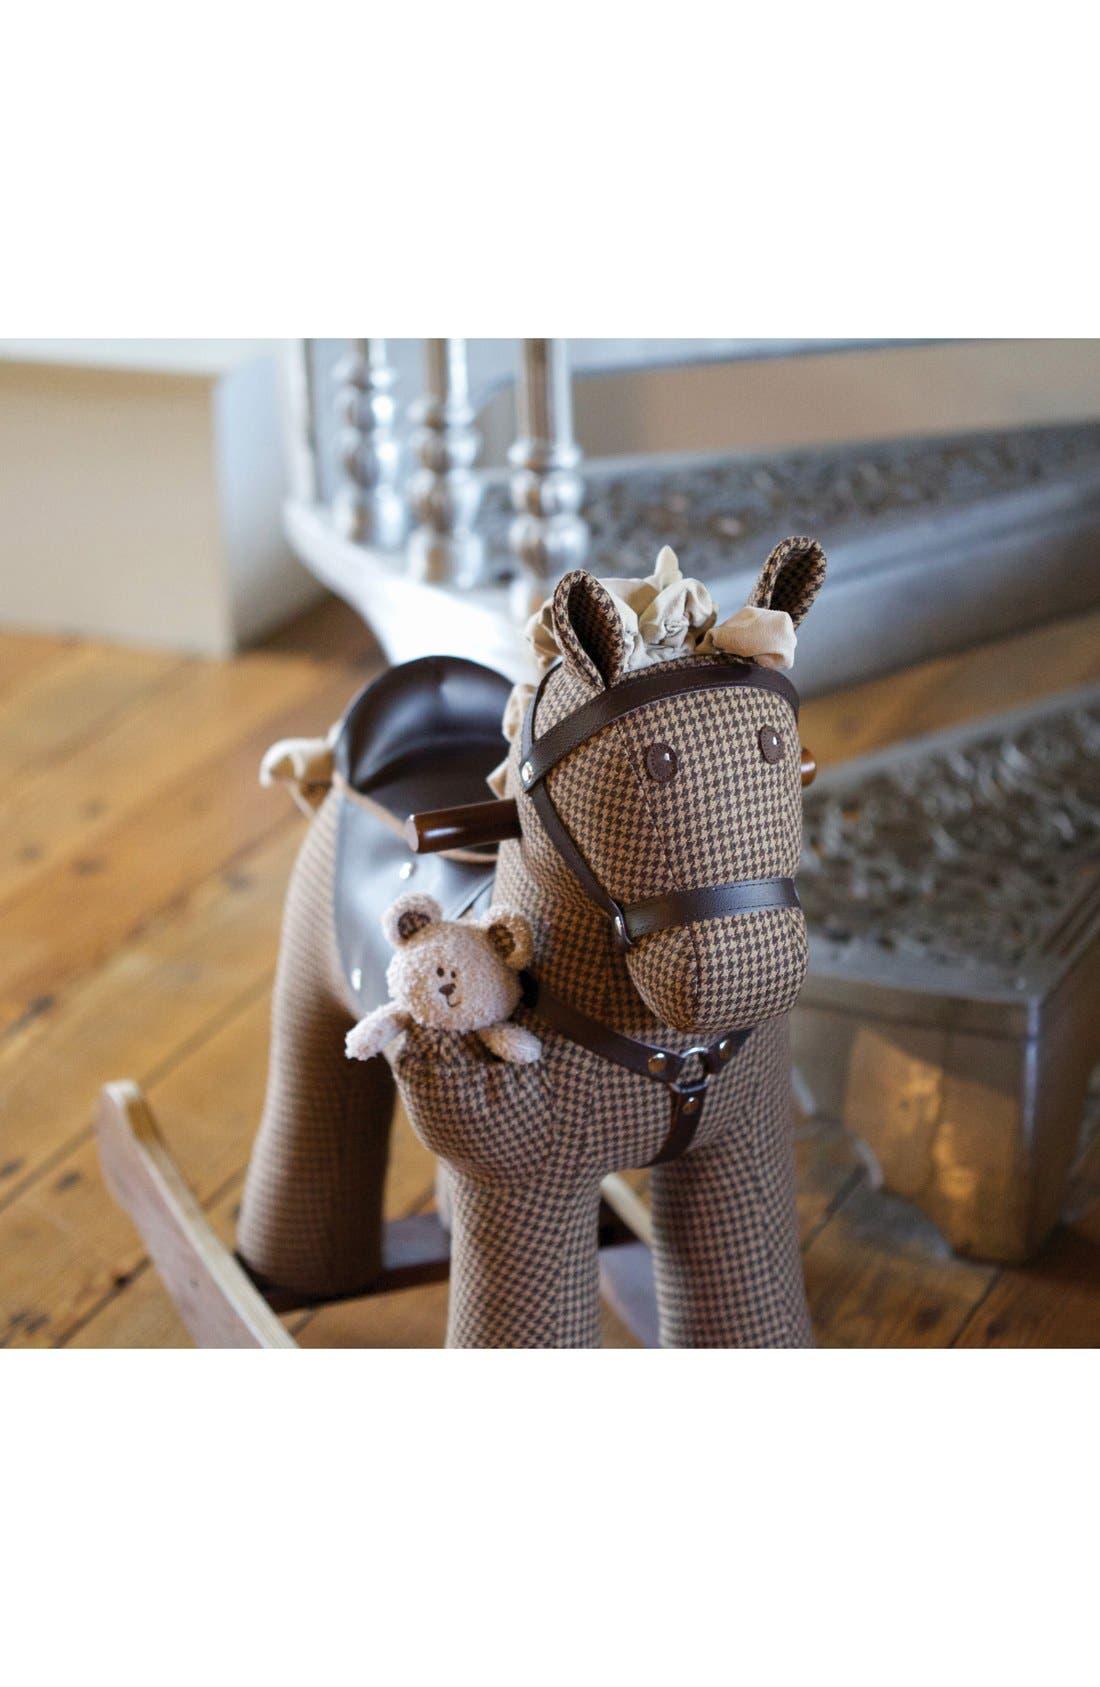 Rocking Horse & Stuffed Animal,                             Alternate thumbnail 4, color,                             001